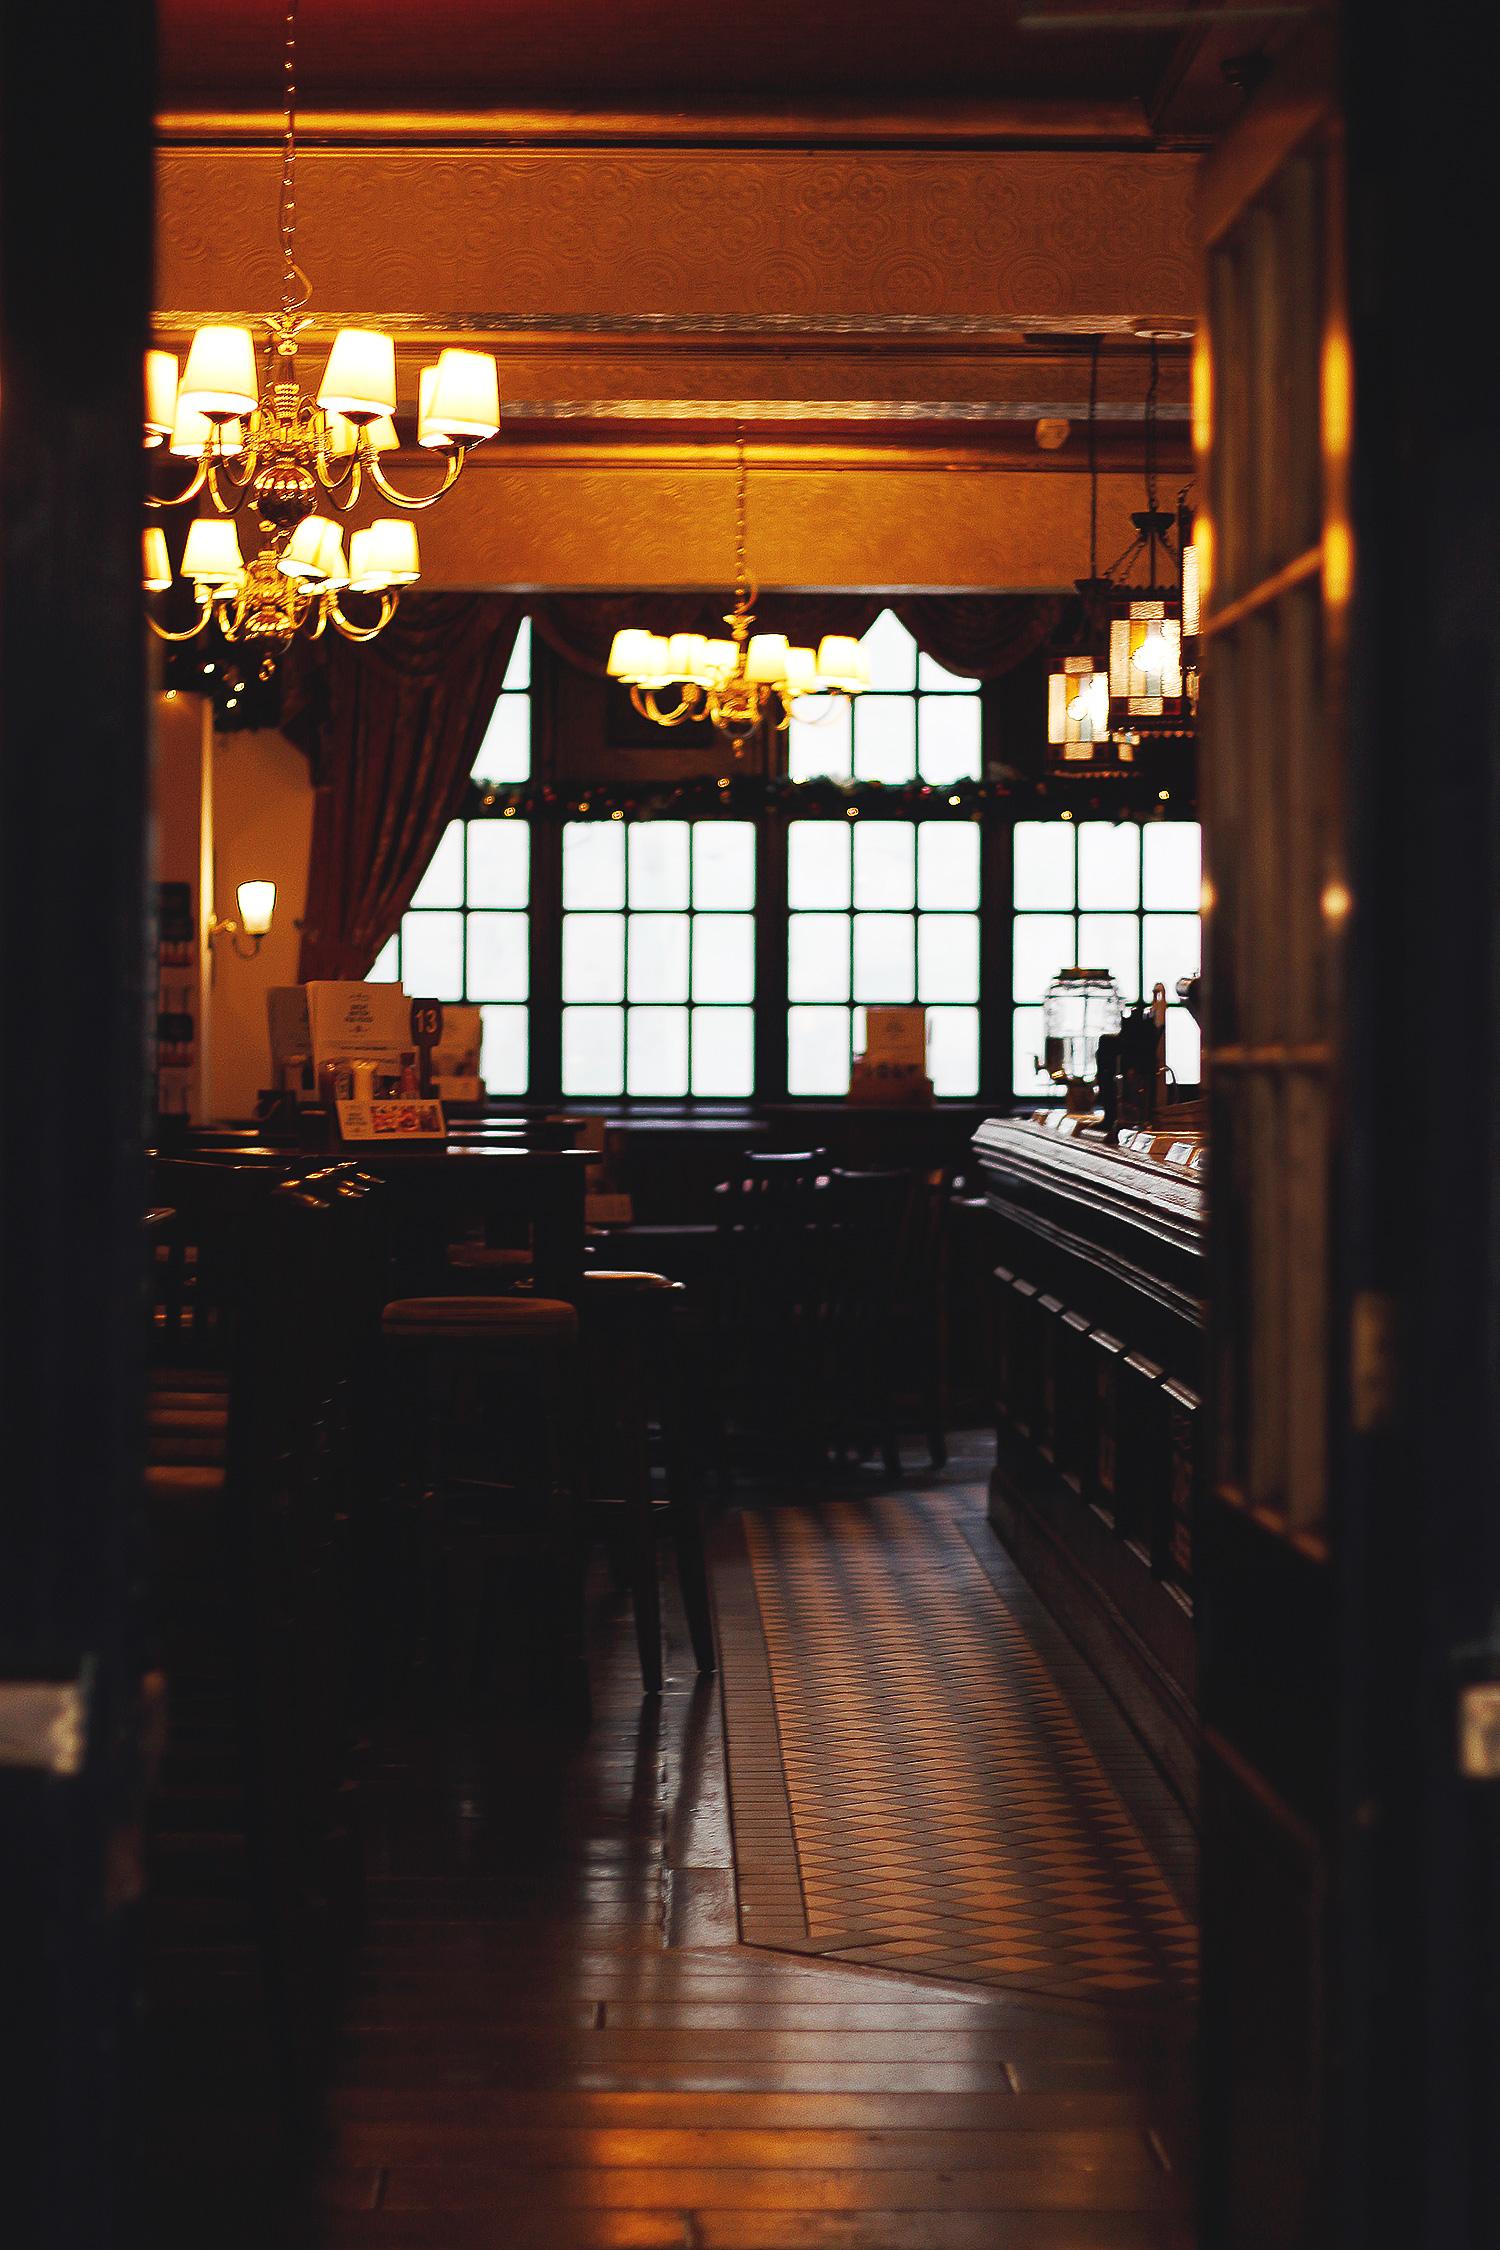 engelsk-pub